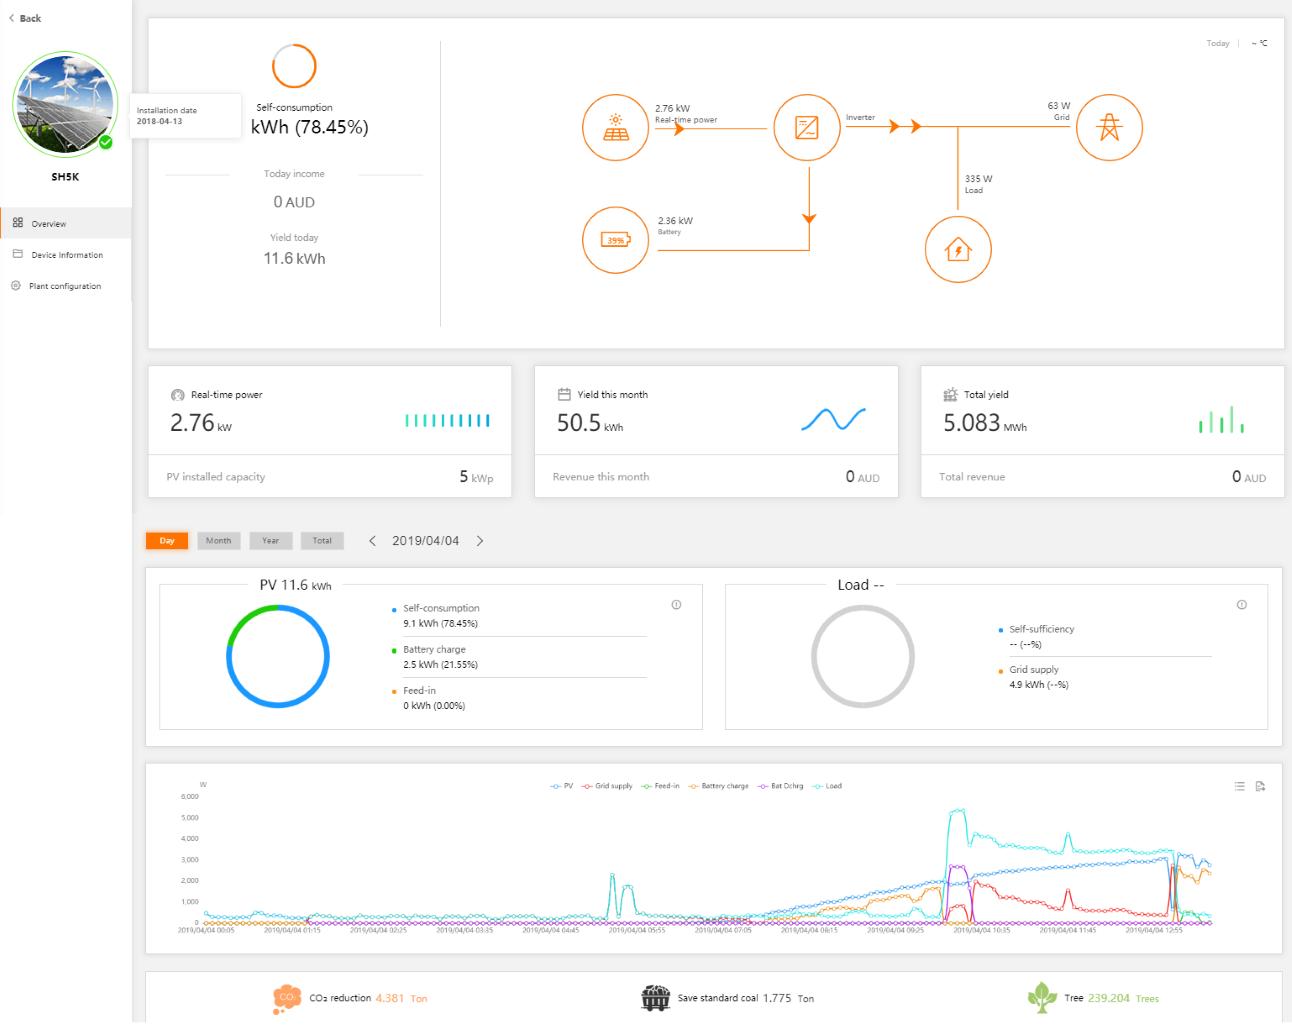 SunGrow Hybrid system monitoring